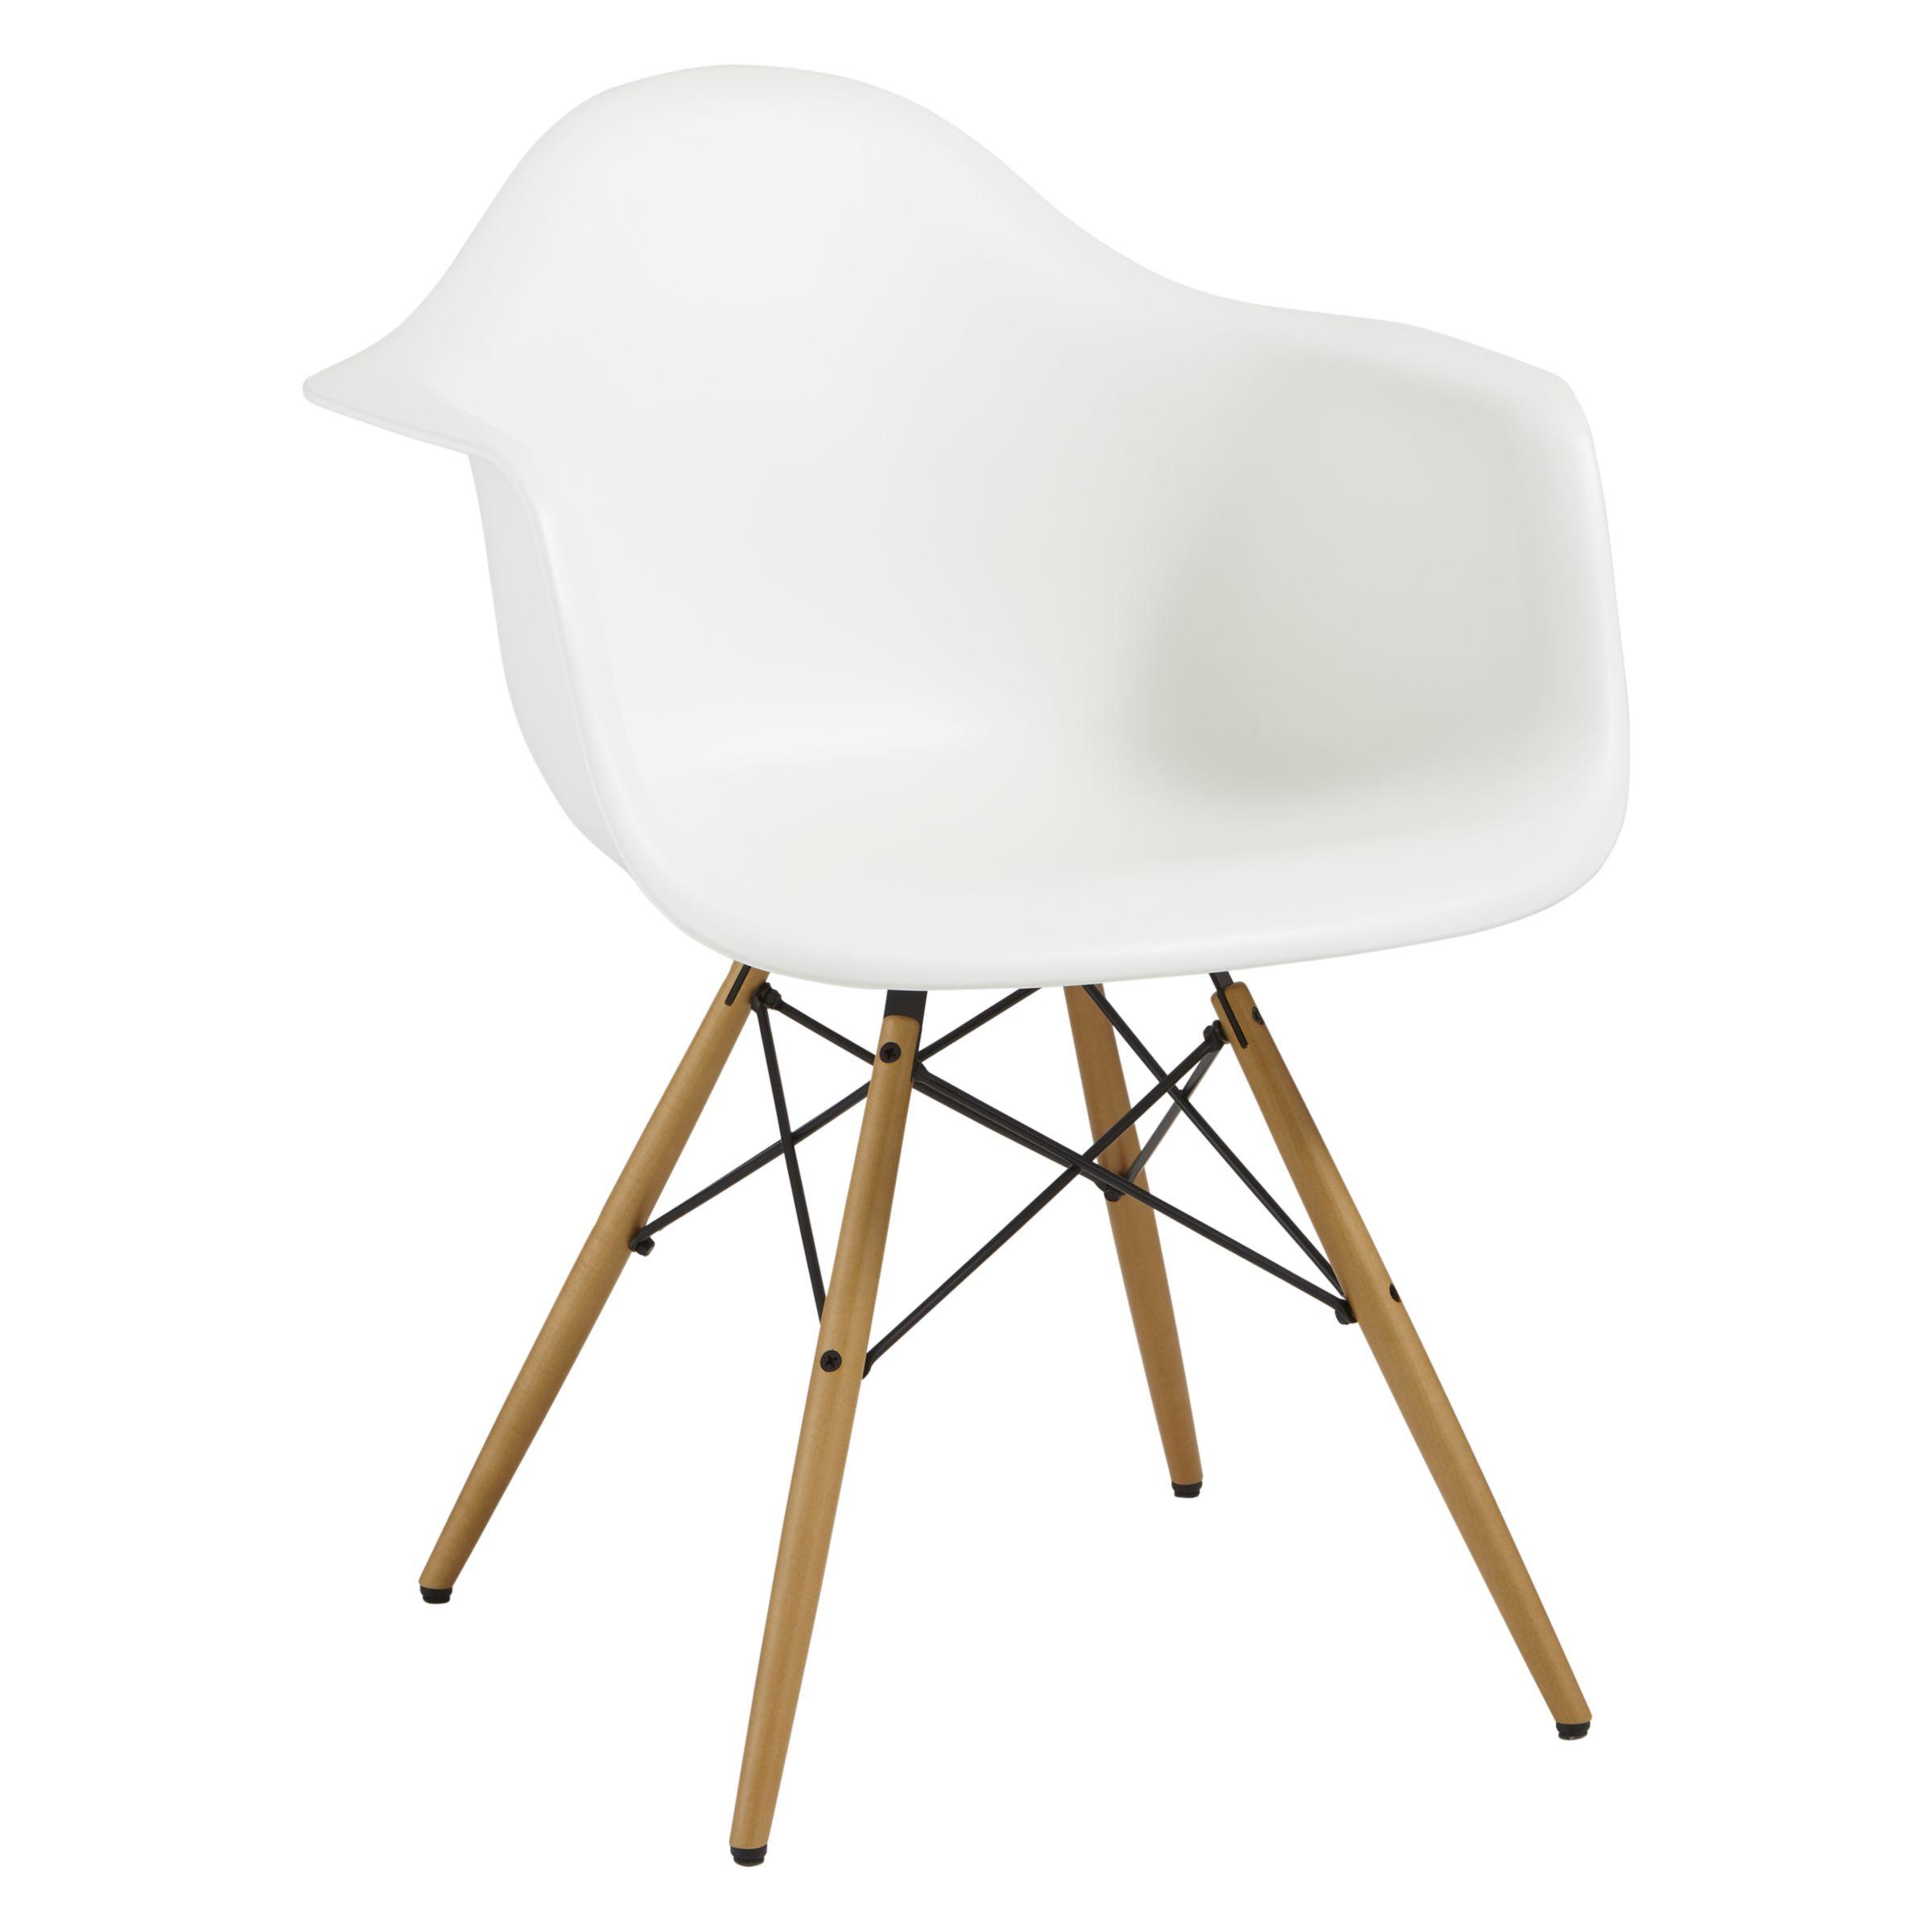 Vitra Vitra Eames DAW Armchair, Light Maple Leg